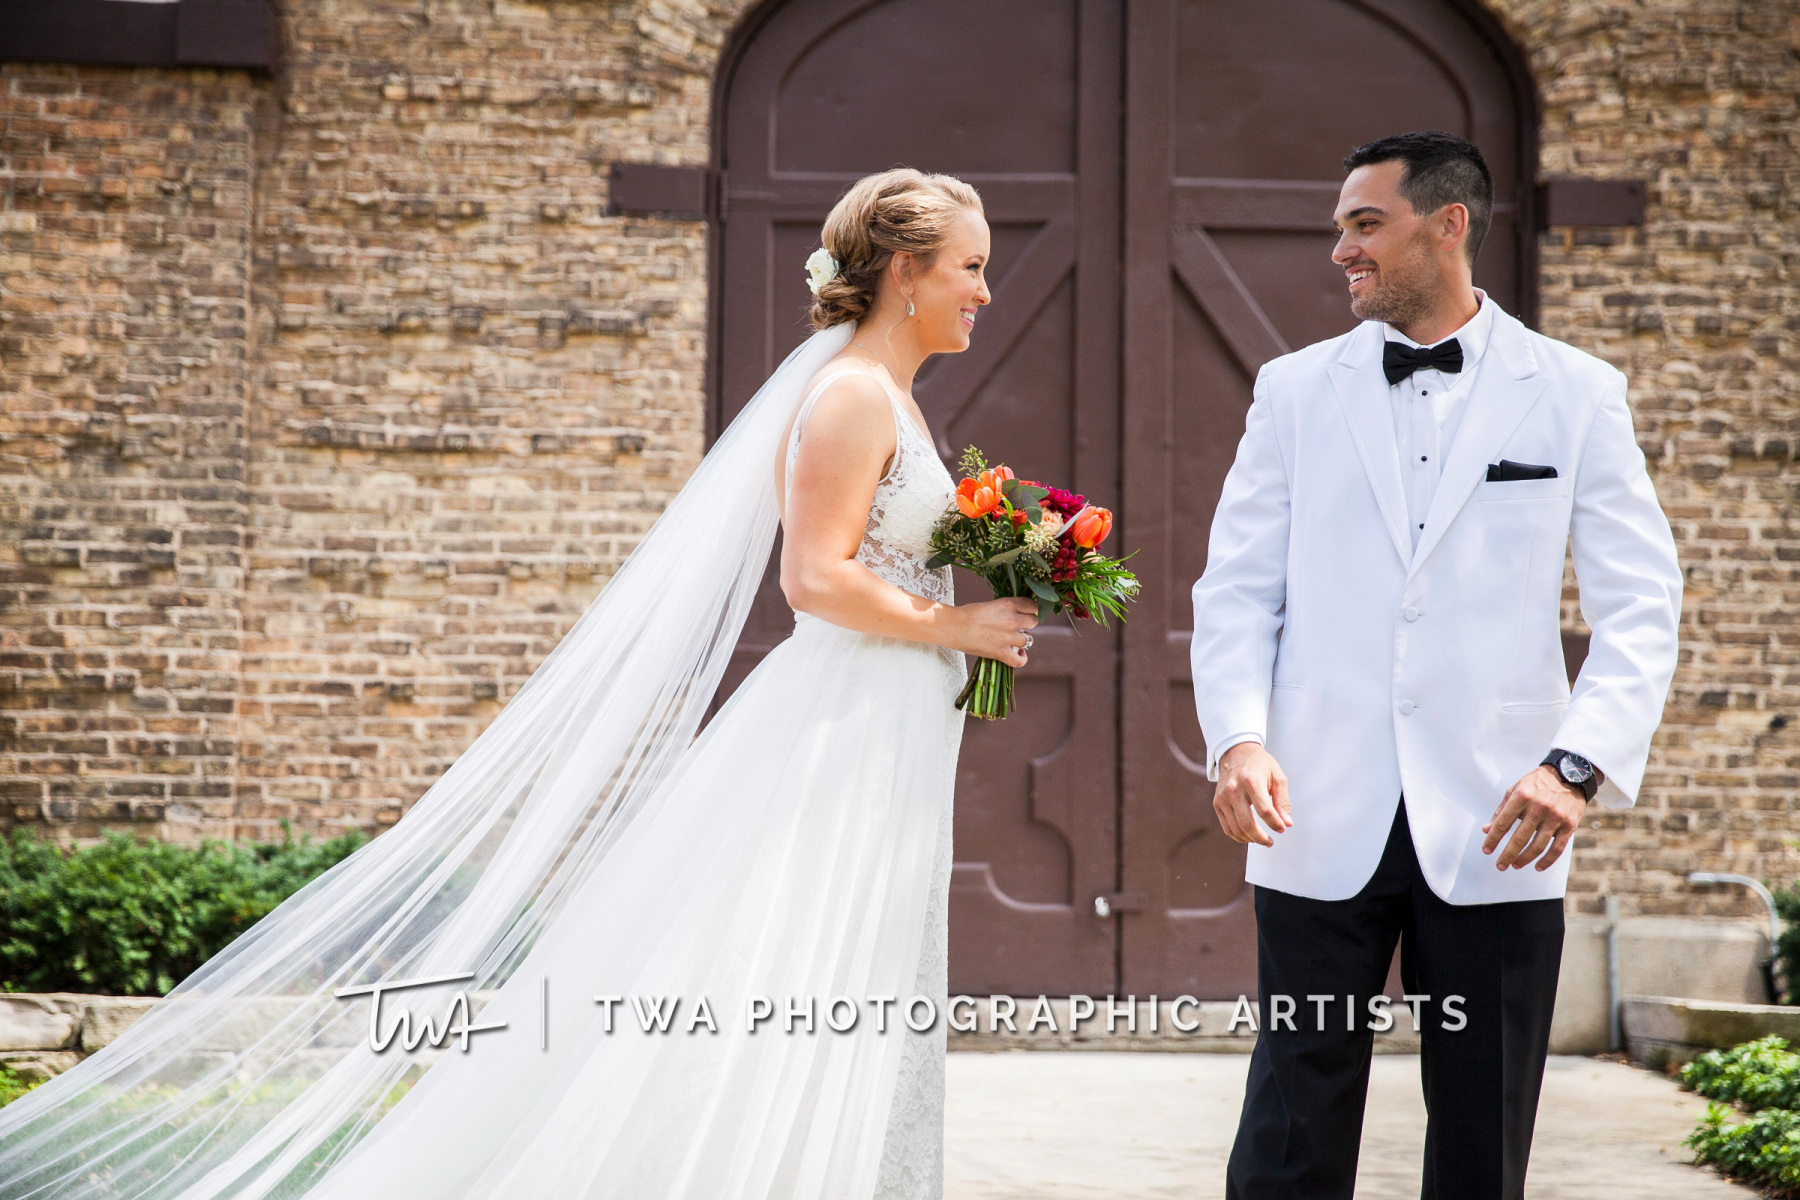 Chicago-Wedding-Photographers-Renaissance-Hotel_Hohensee_Fleishman_JG_DK-012-0988